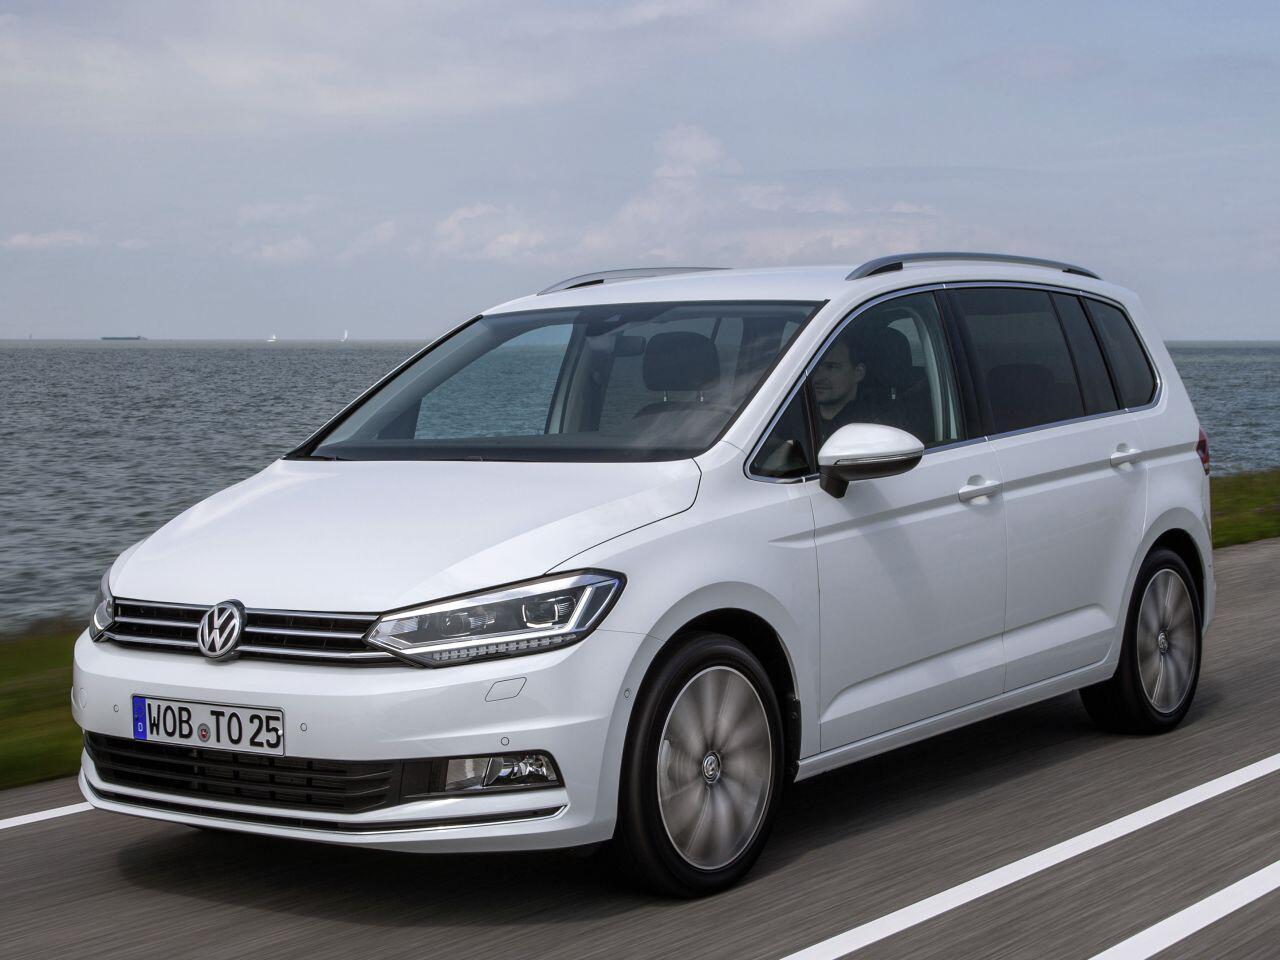 Bild zu Platz 9: VW Touran